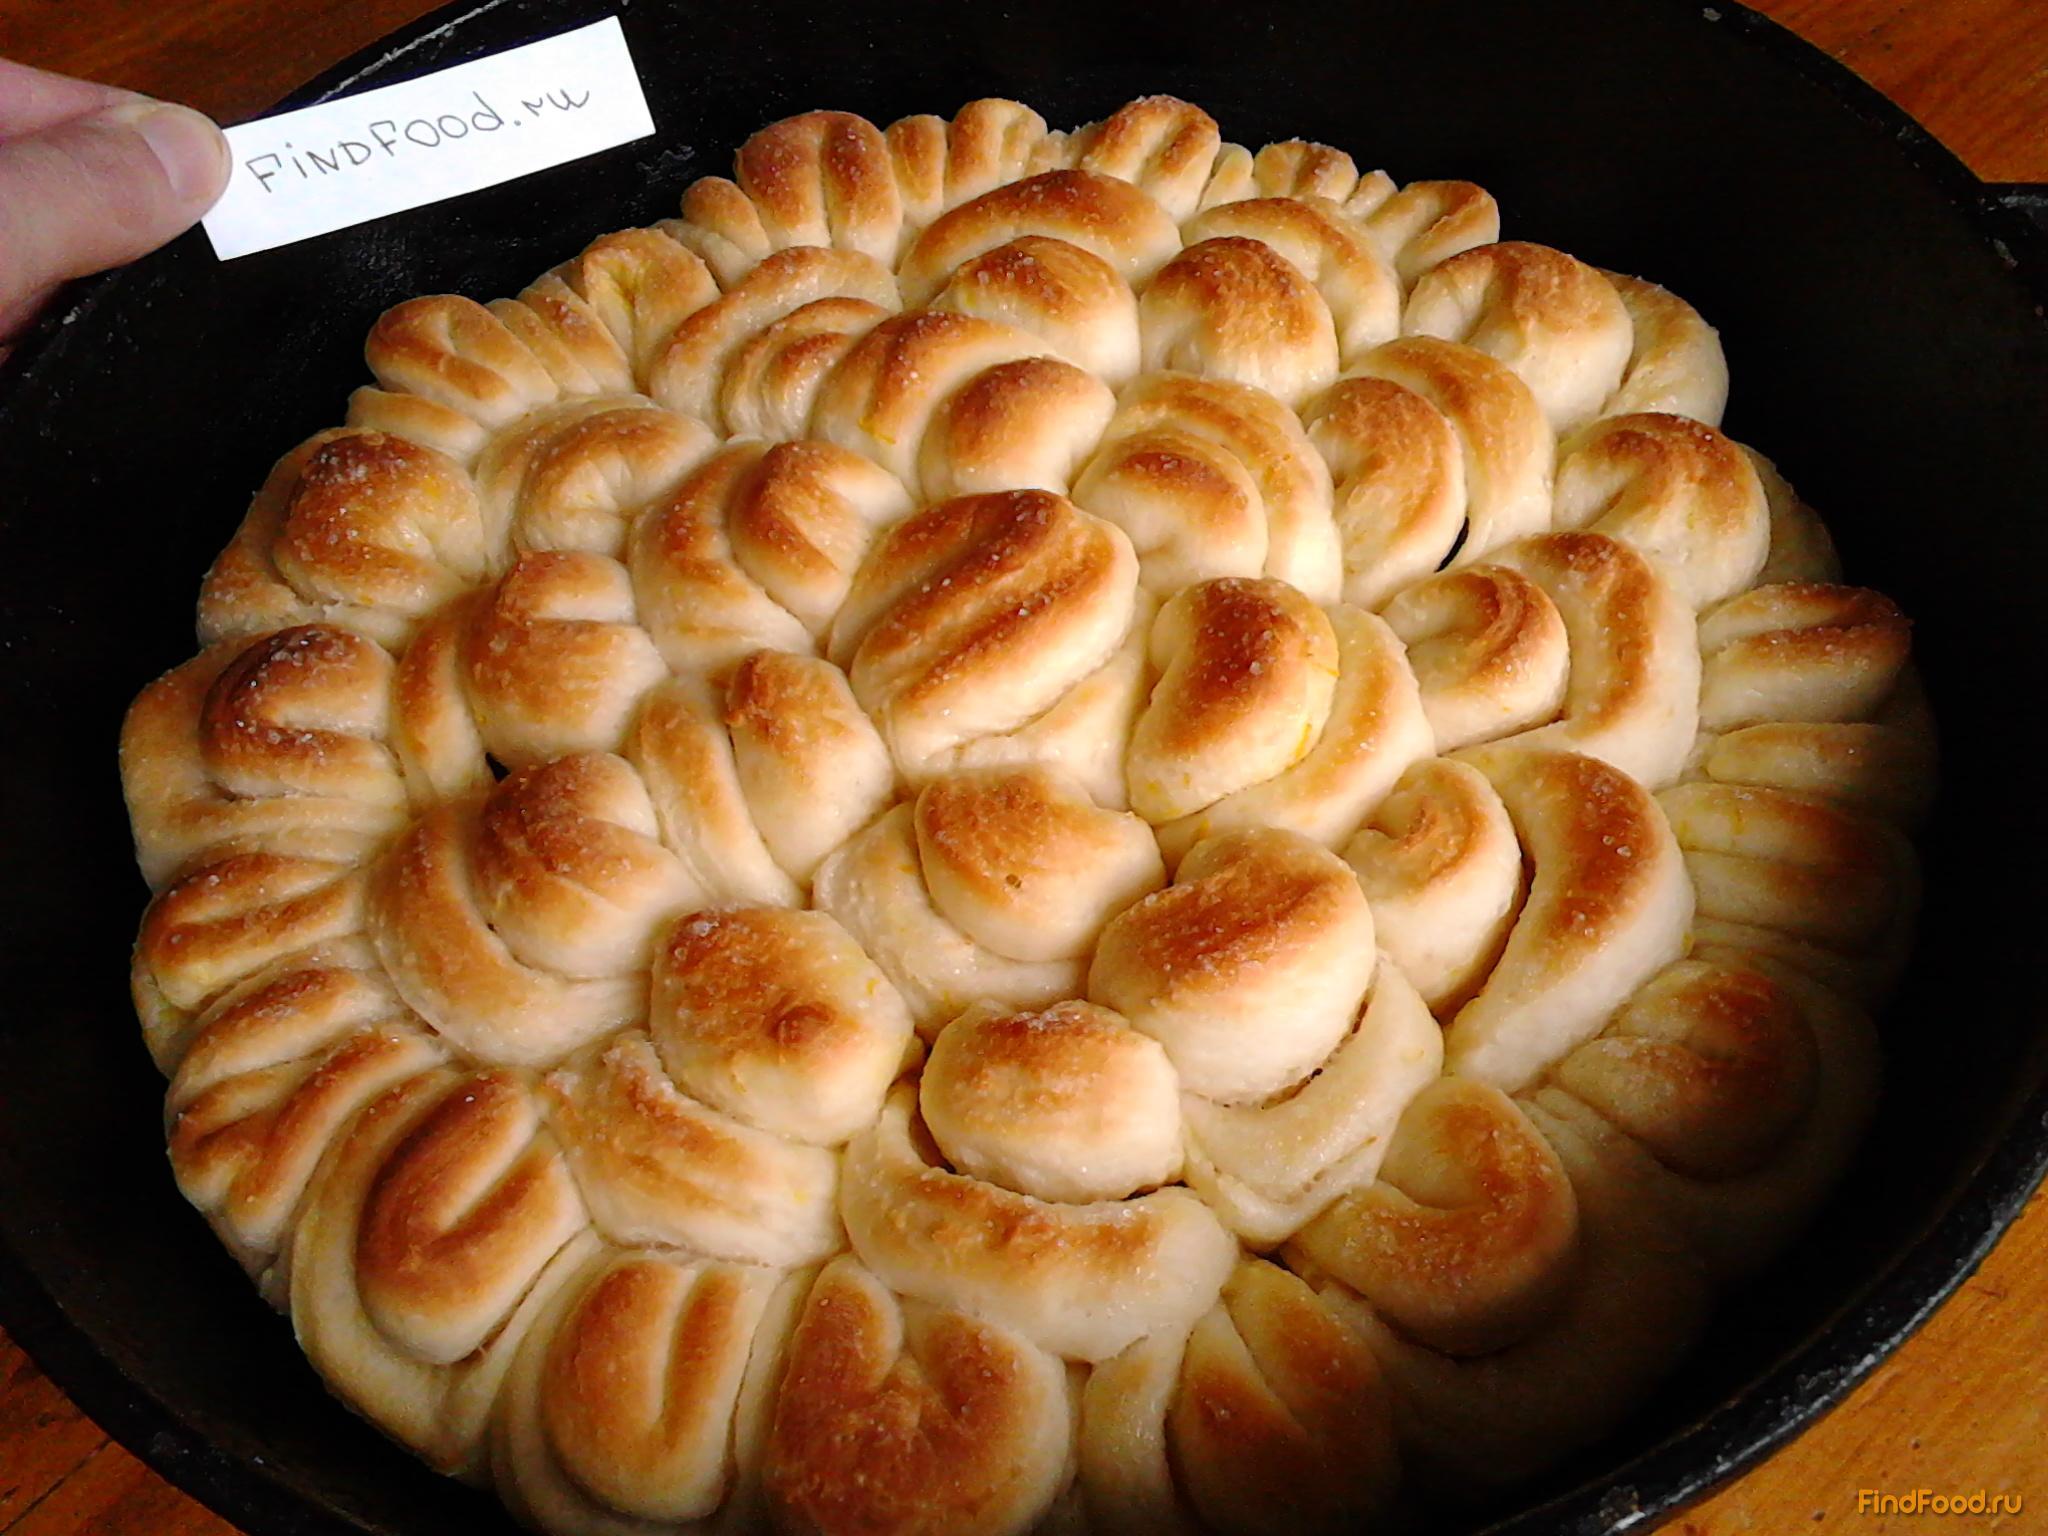 Рецепты пирогов из дрожжевого теста в домашних условиях